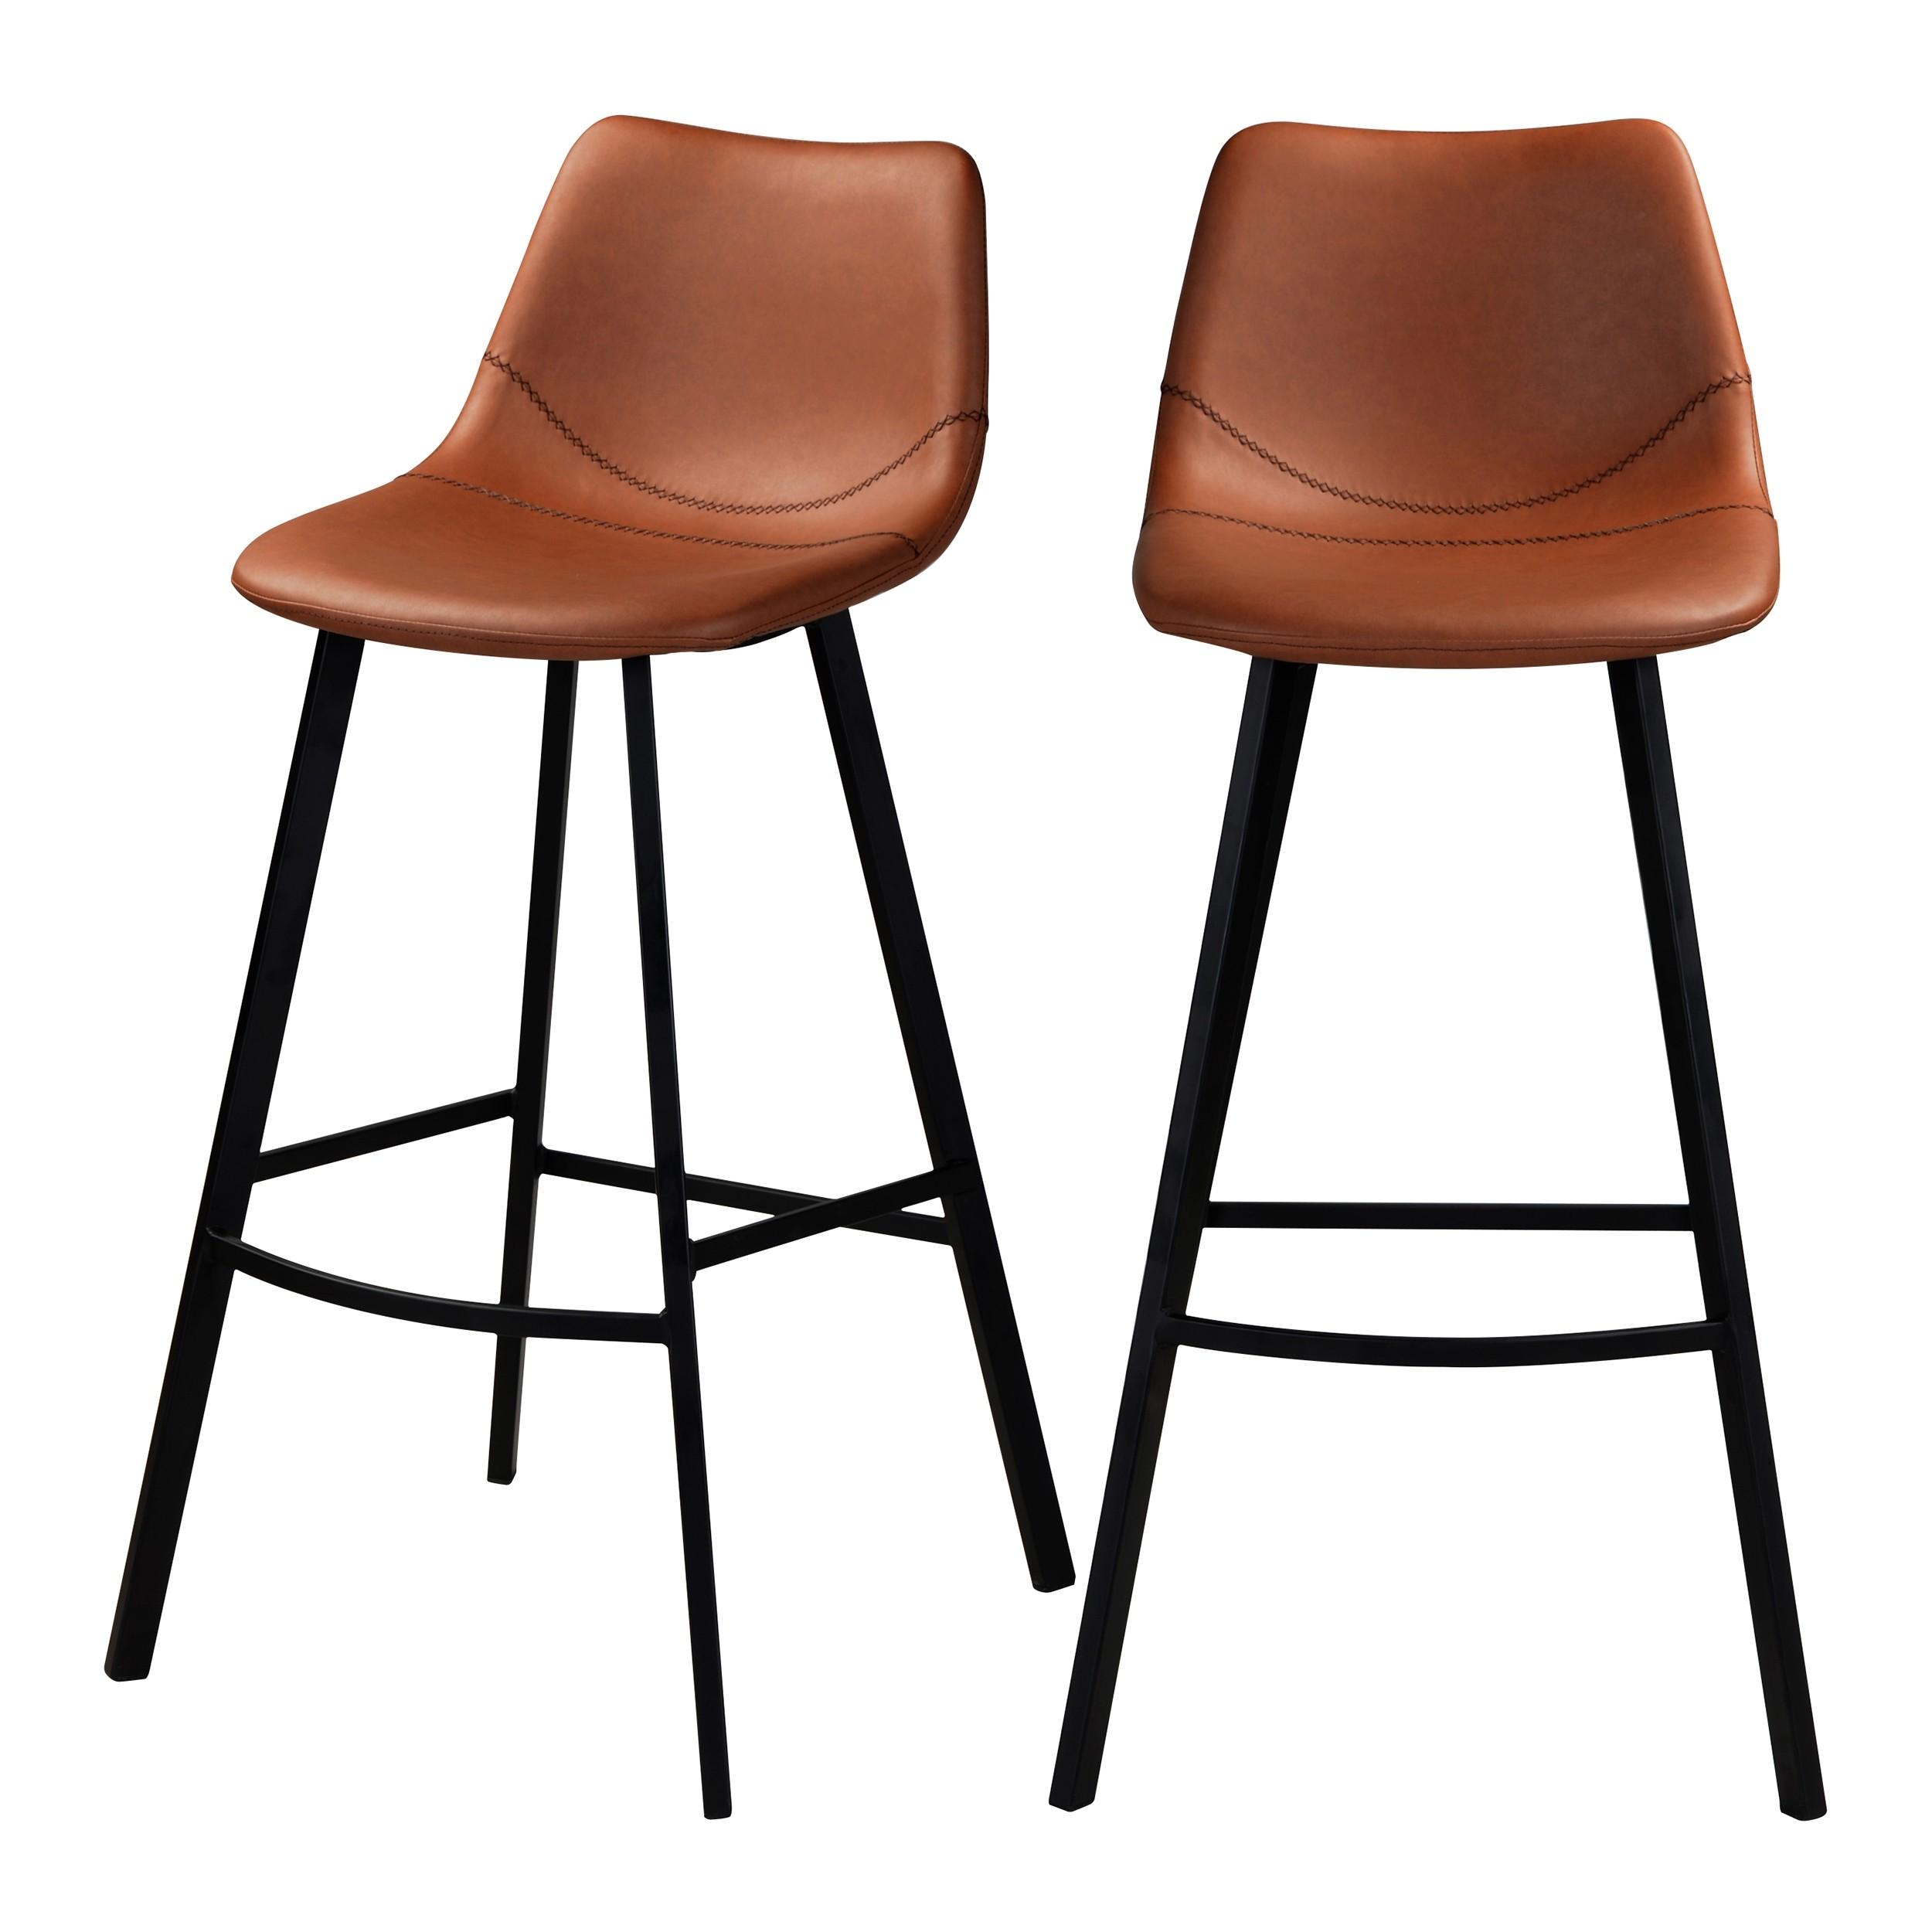 acheter chaise de bar marron cuir synthetique lot de 2